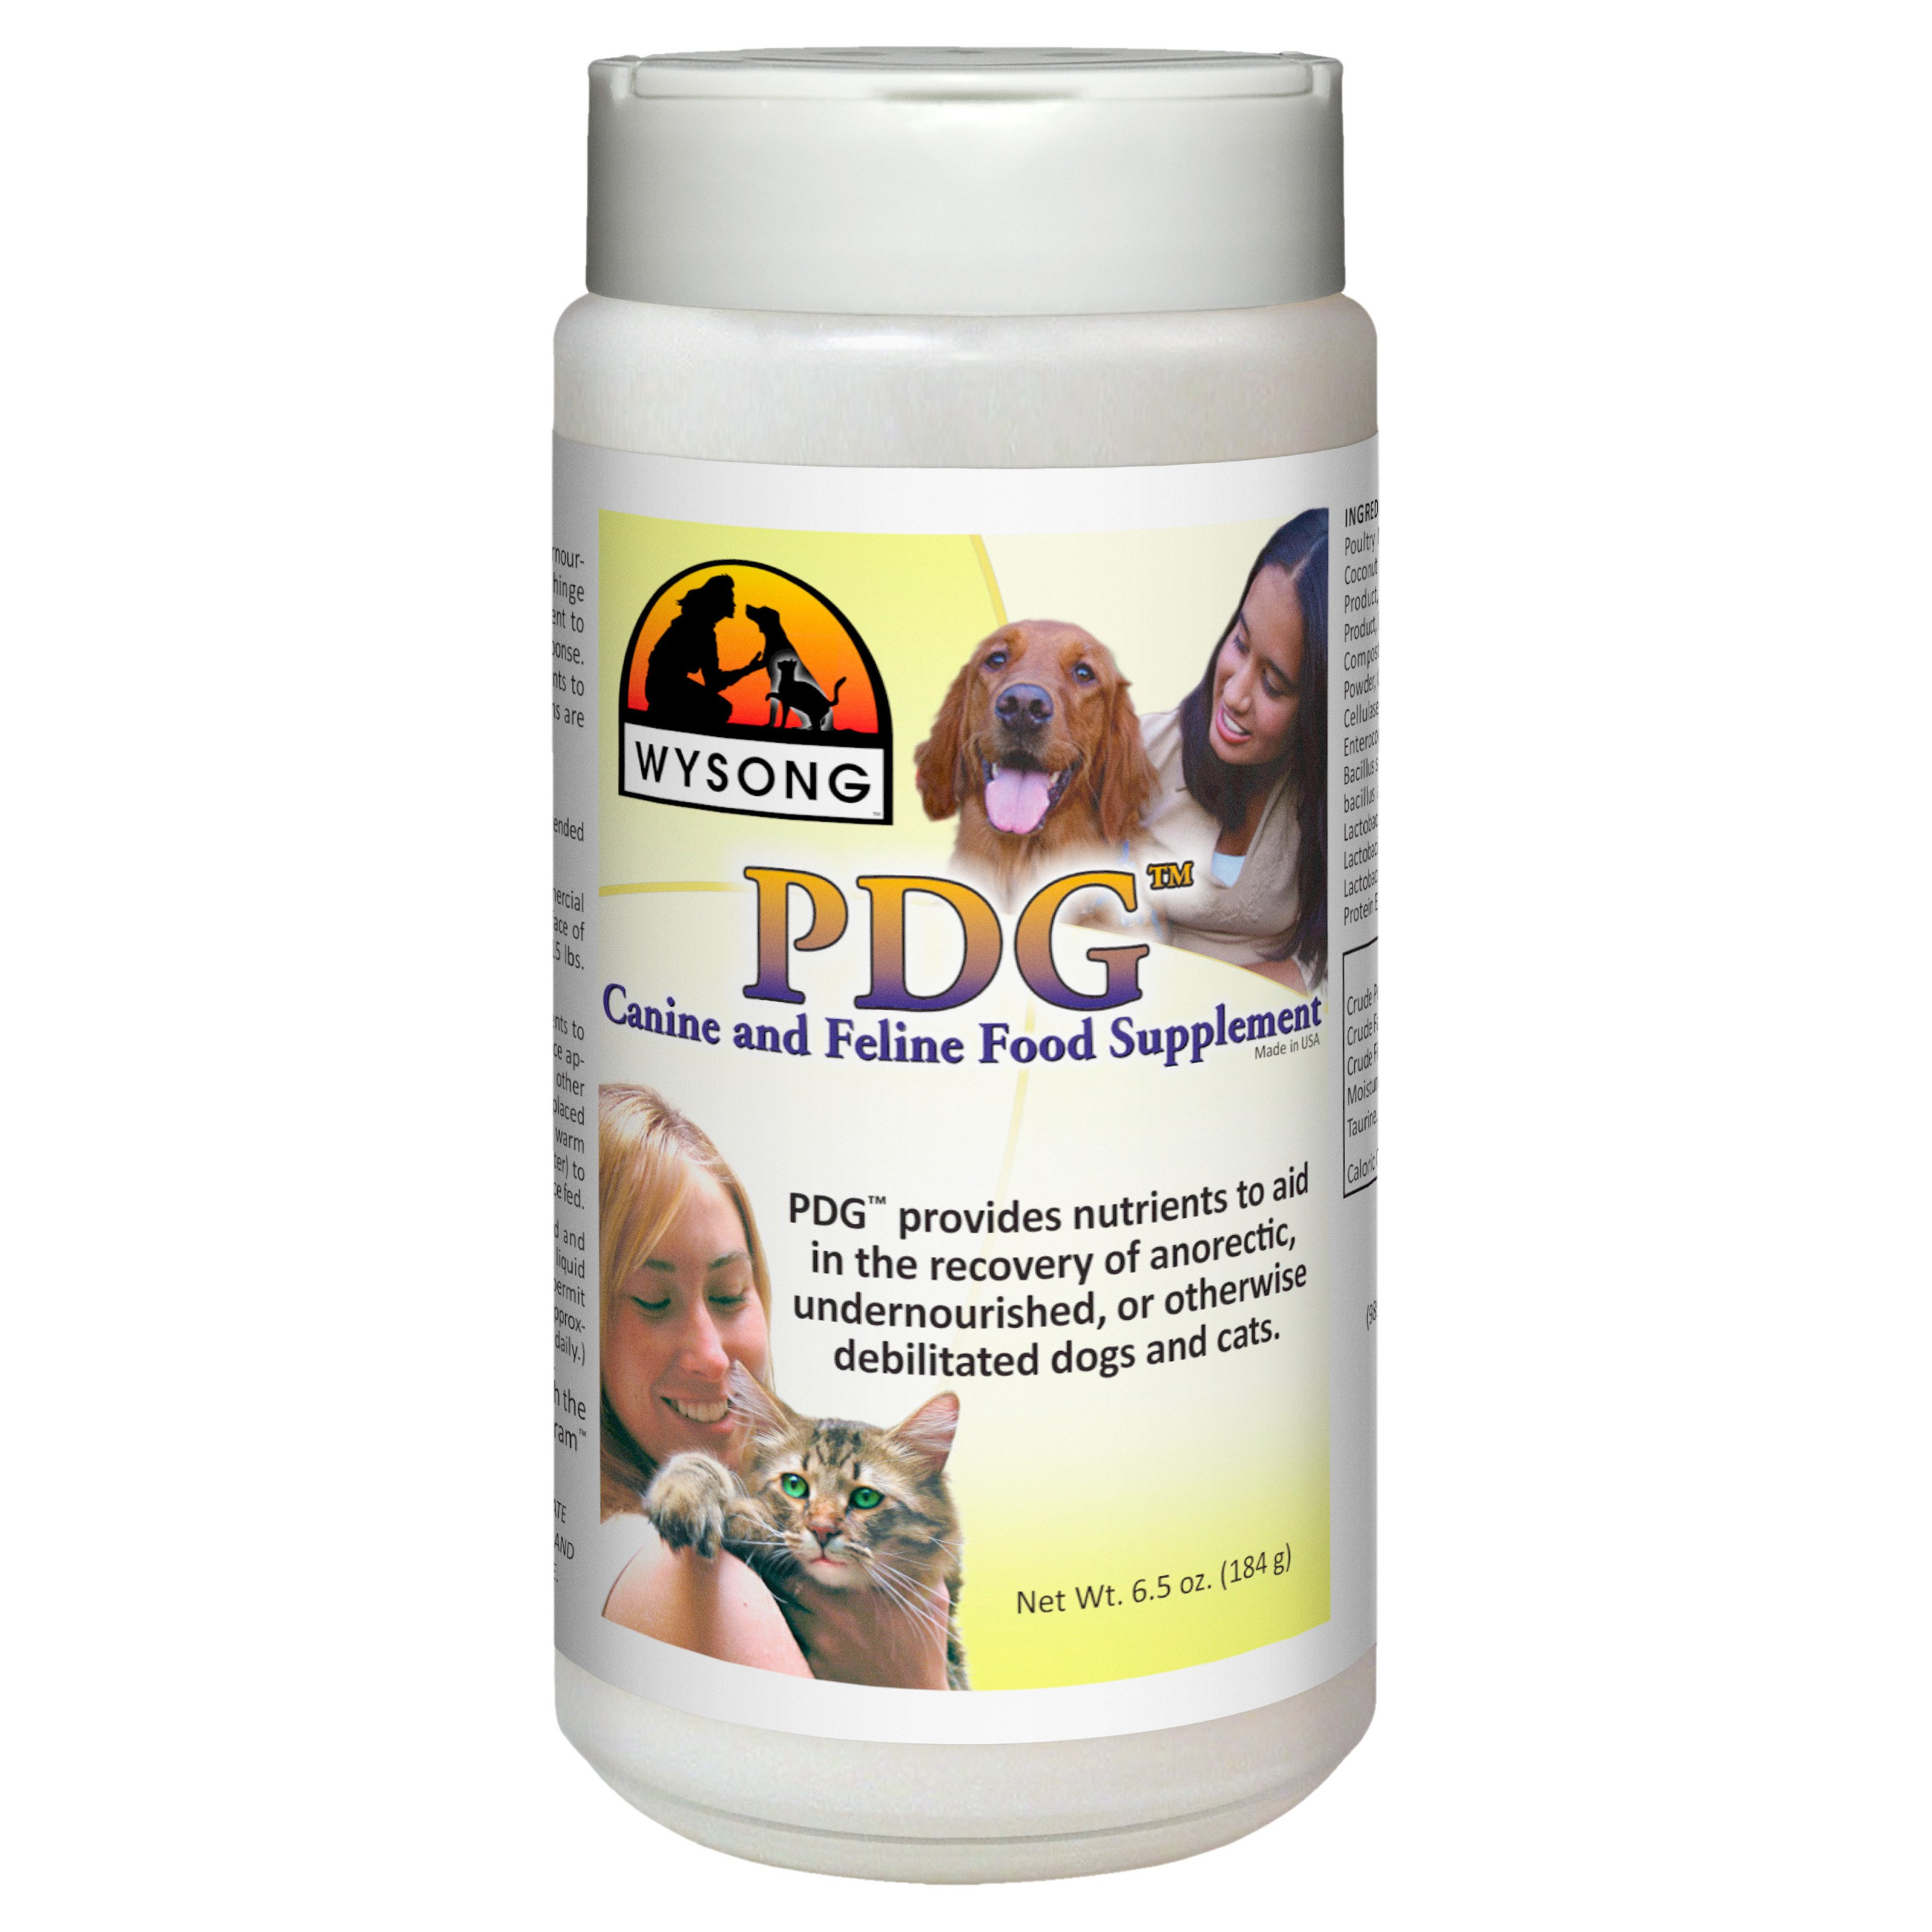 Wysong PDG Canine/Feline Food Supplement